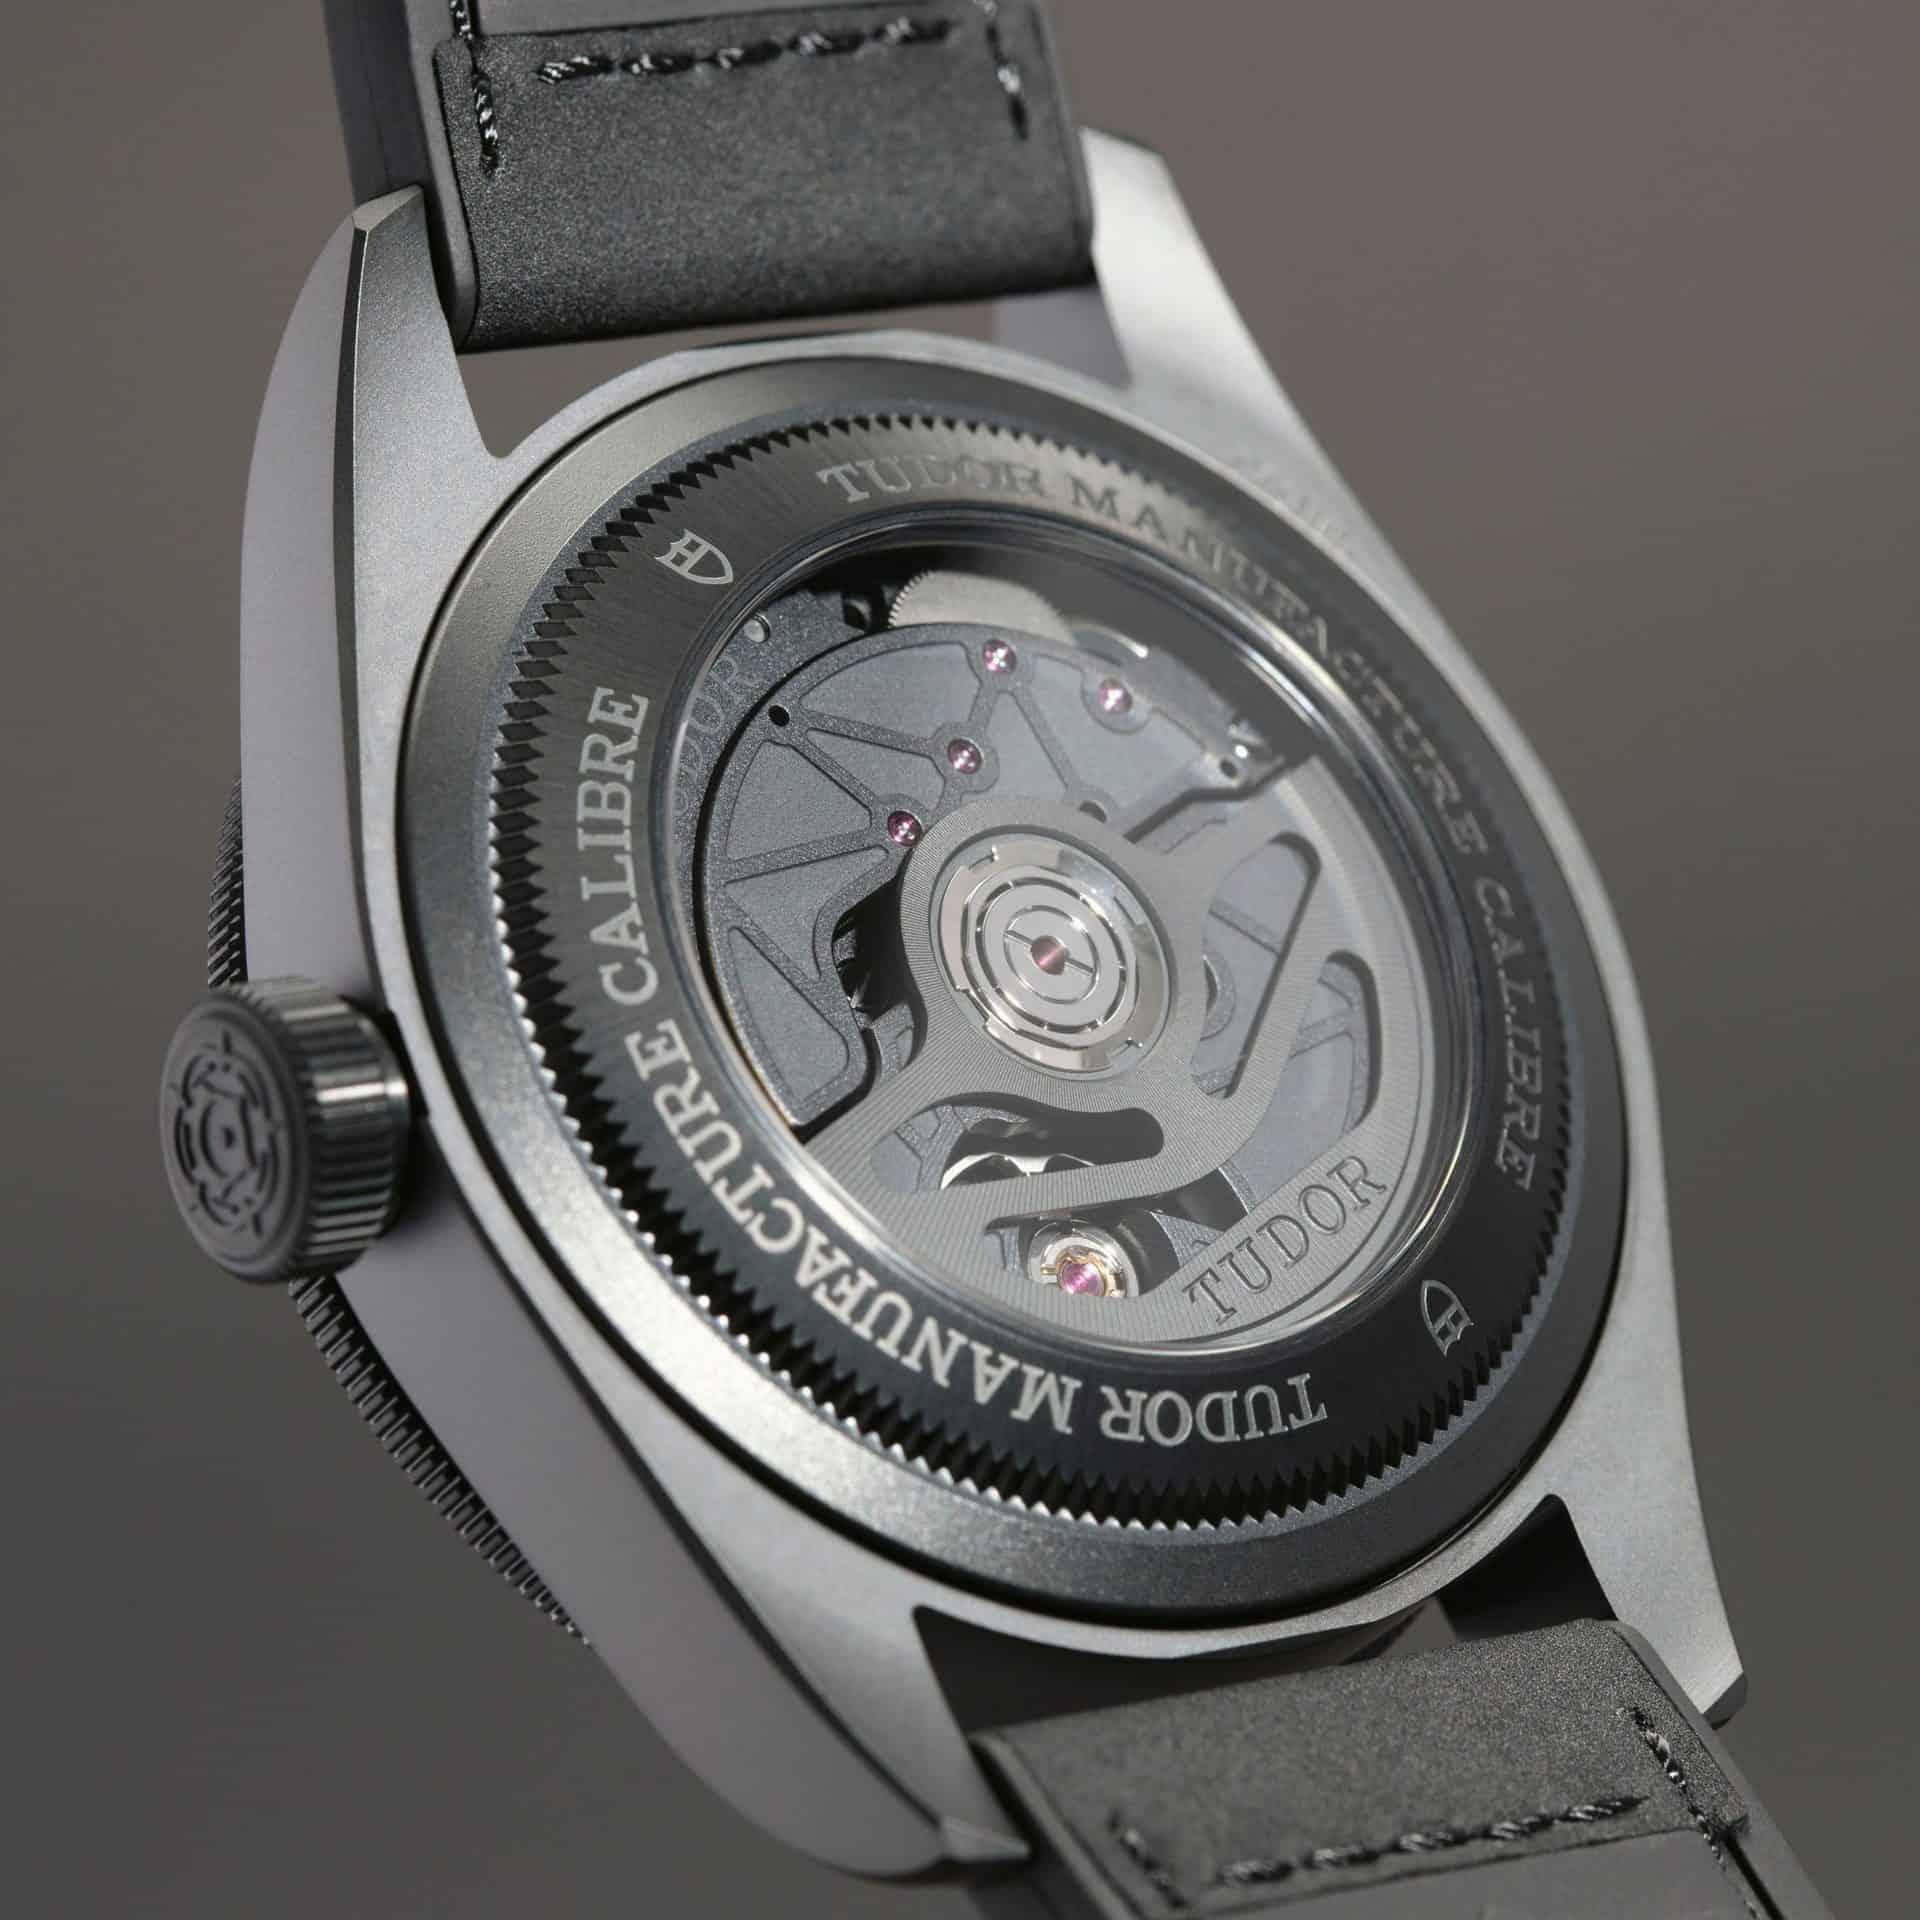 Sichtboden der Black Bay Ceramic Master Chronometer, Referenz 79210CNU